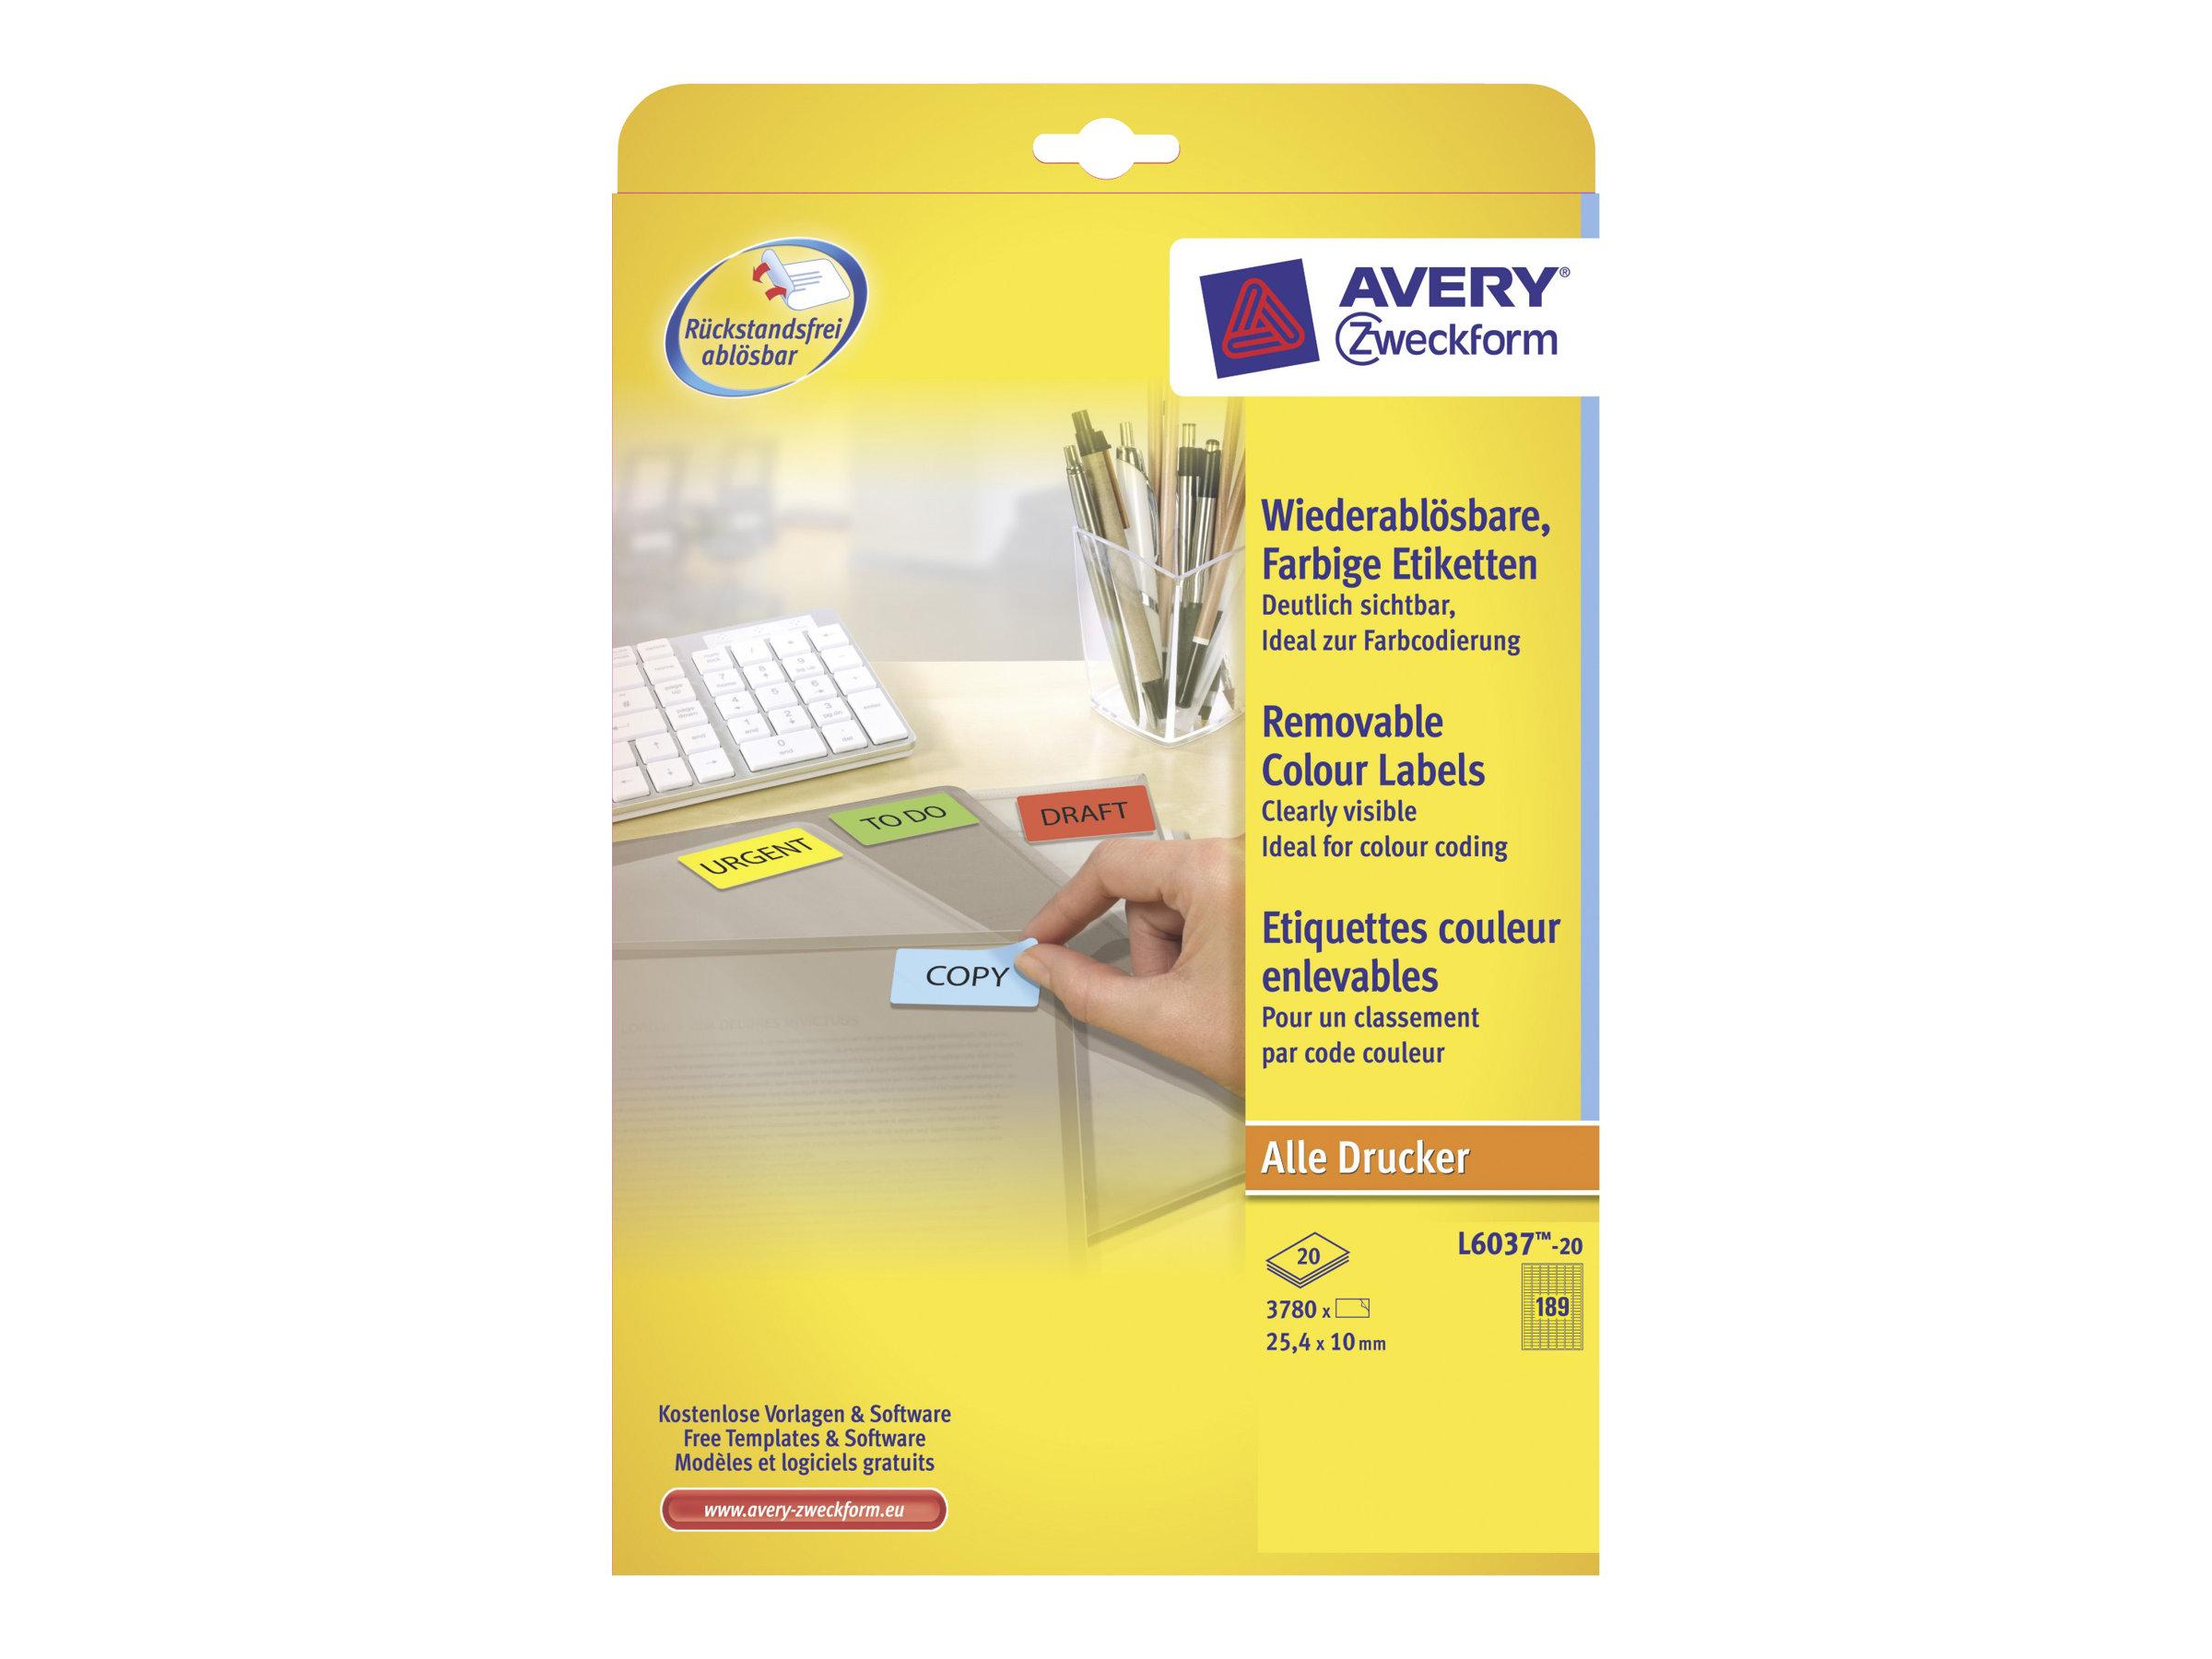 Avery Zweckform L6037 - Gelb - 10 x 25.4 mm 3780 Stck. (20 Bogen x 189) Etiketten